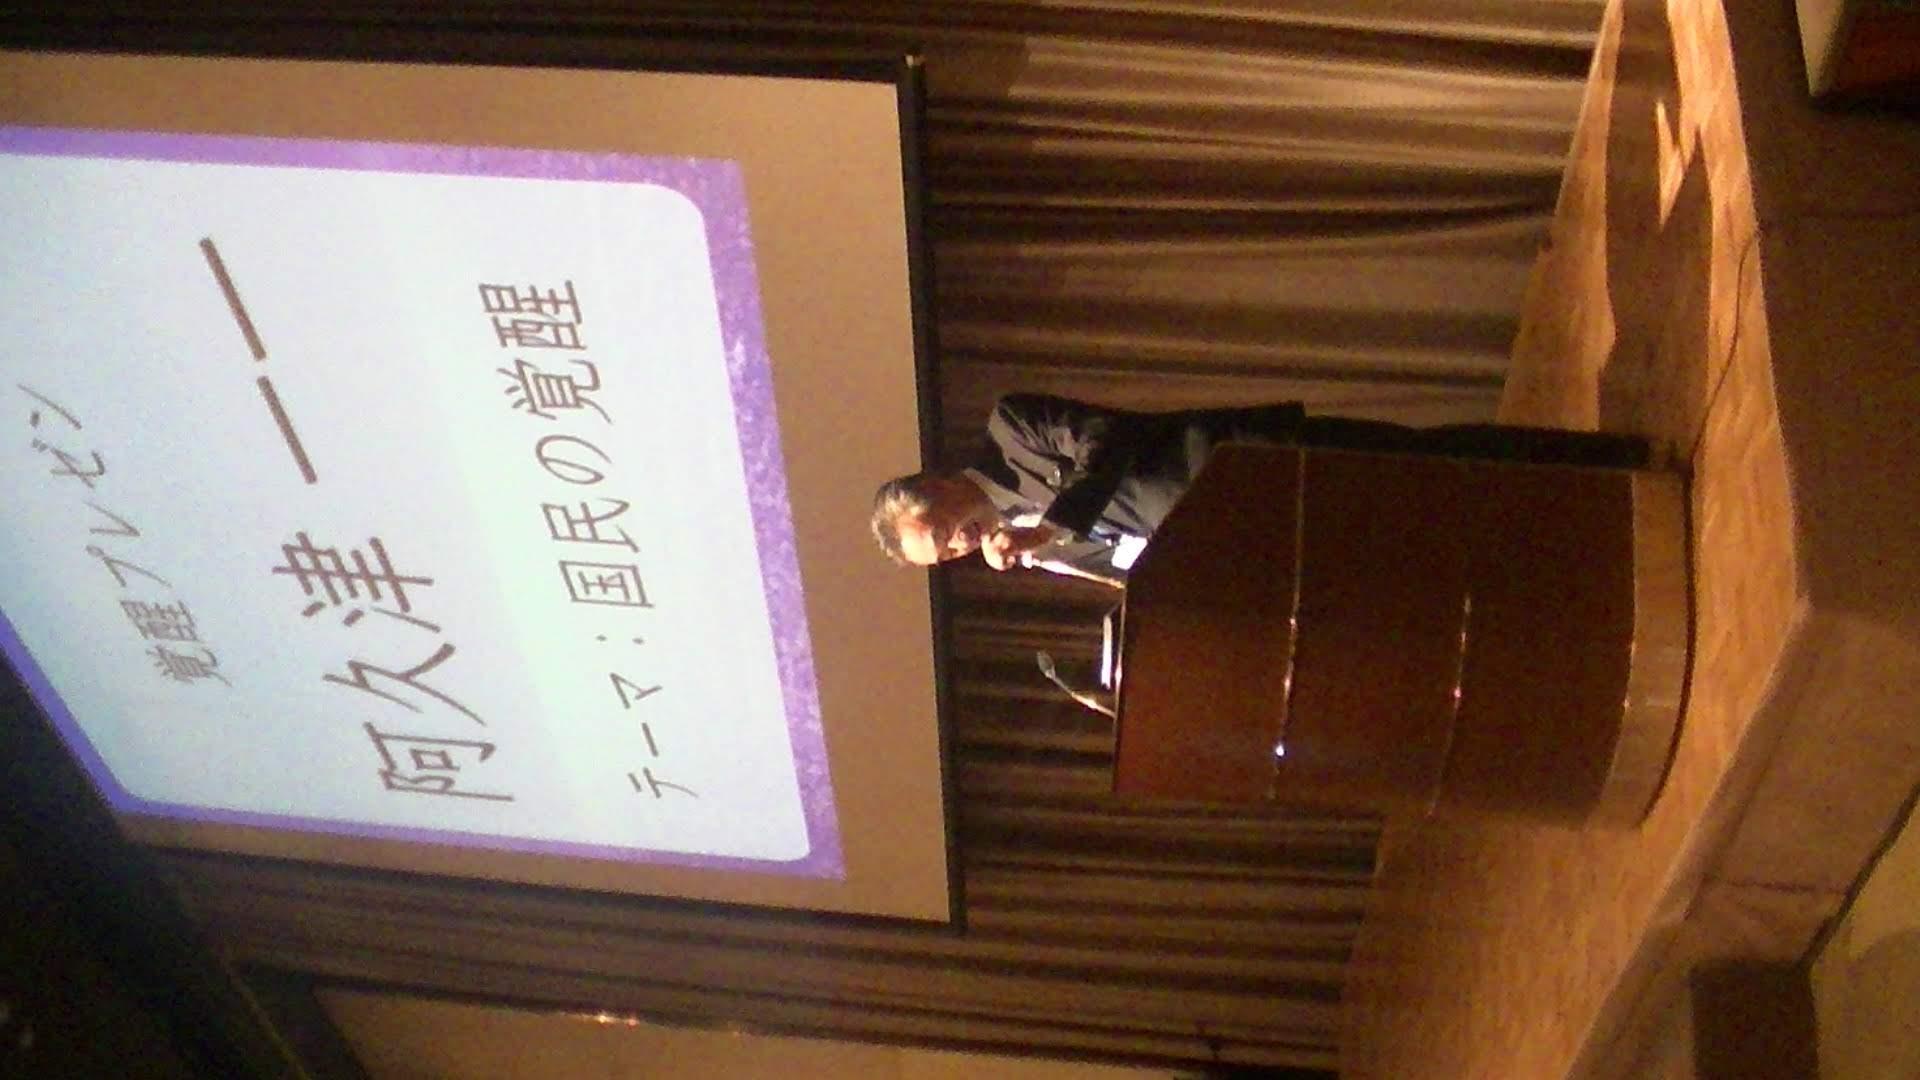 PIC 1766 1 - 思風会全国大会in広島